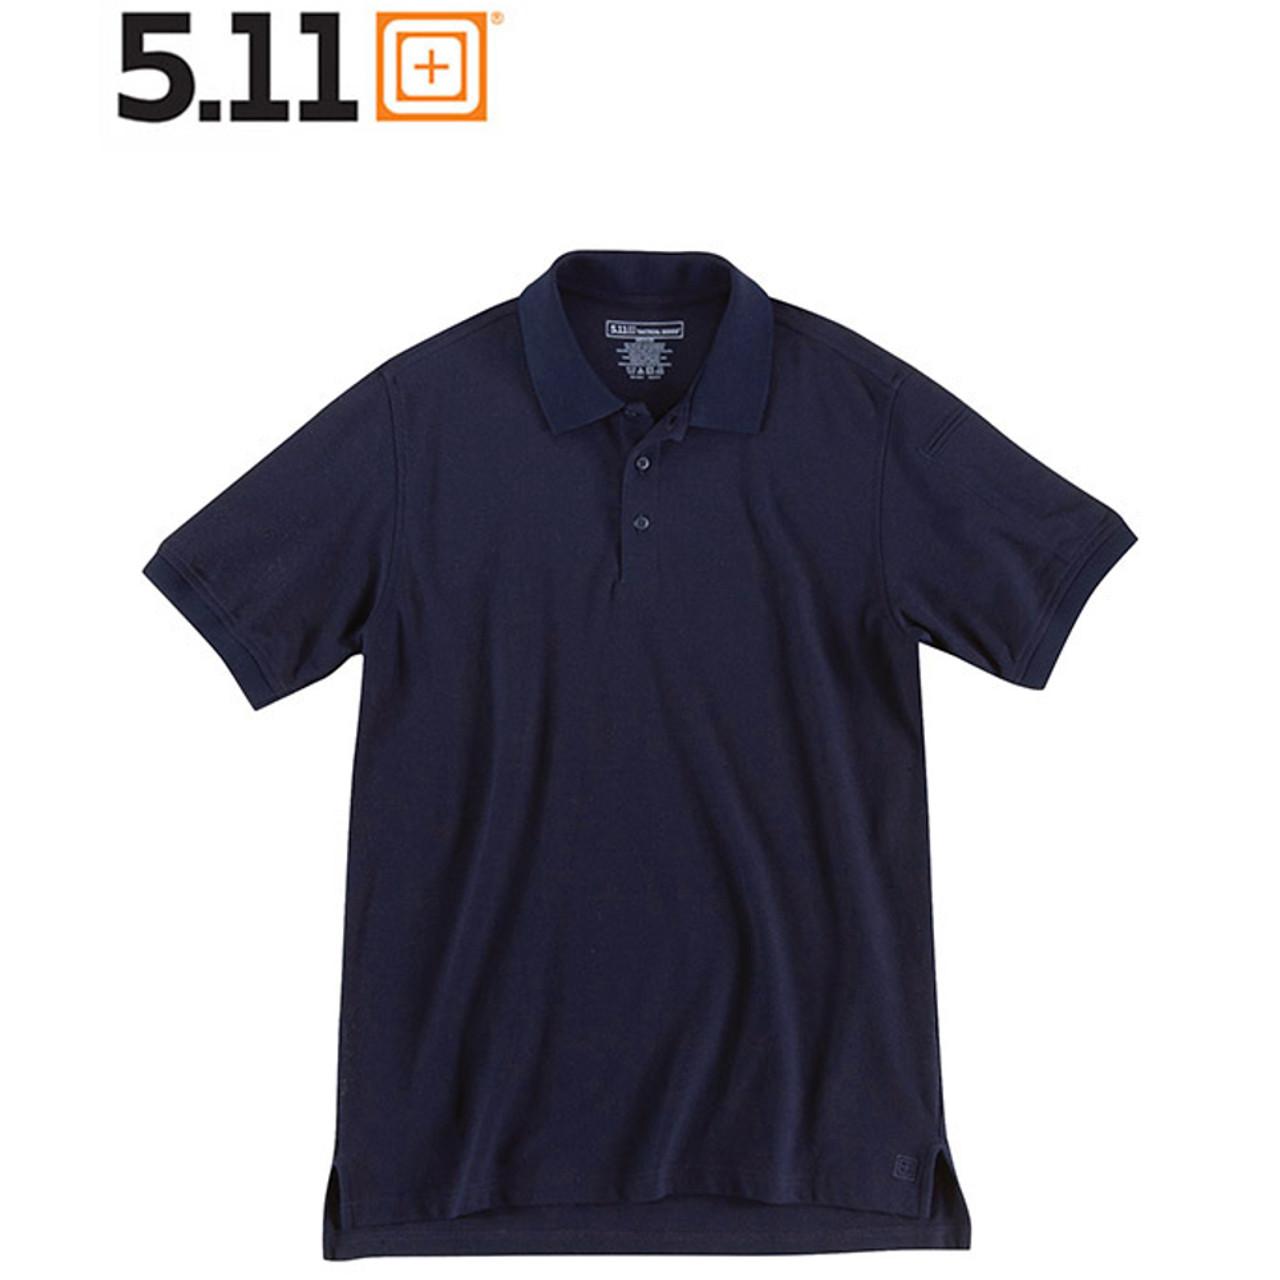 5.11 UTILITY POLO Kurzarm-Shirt dark navy